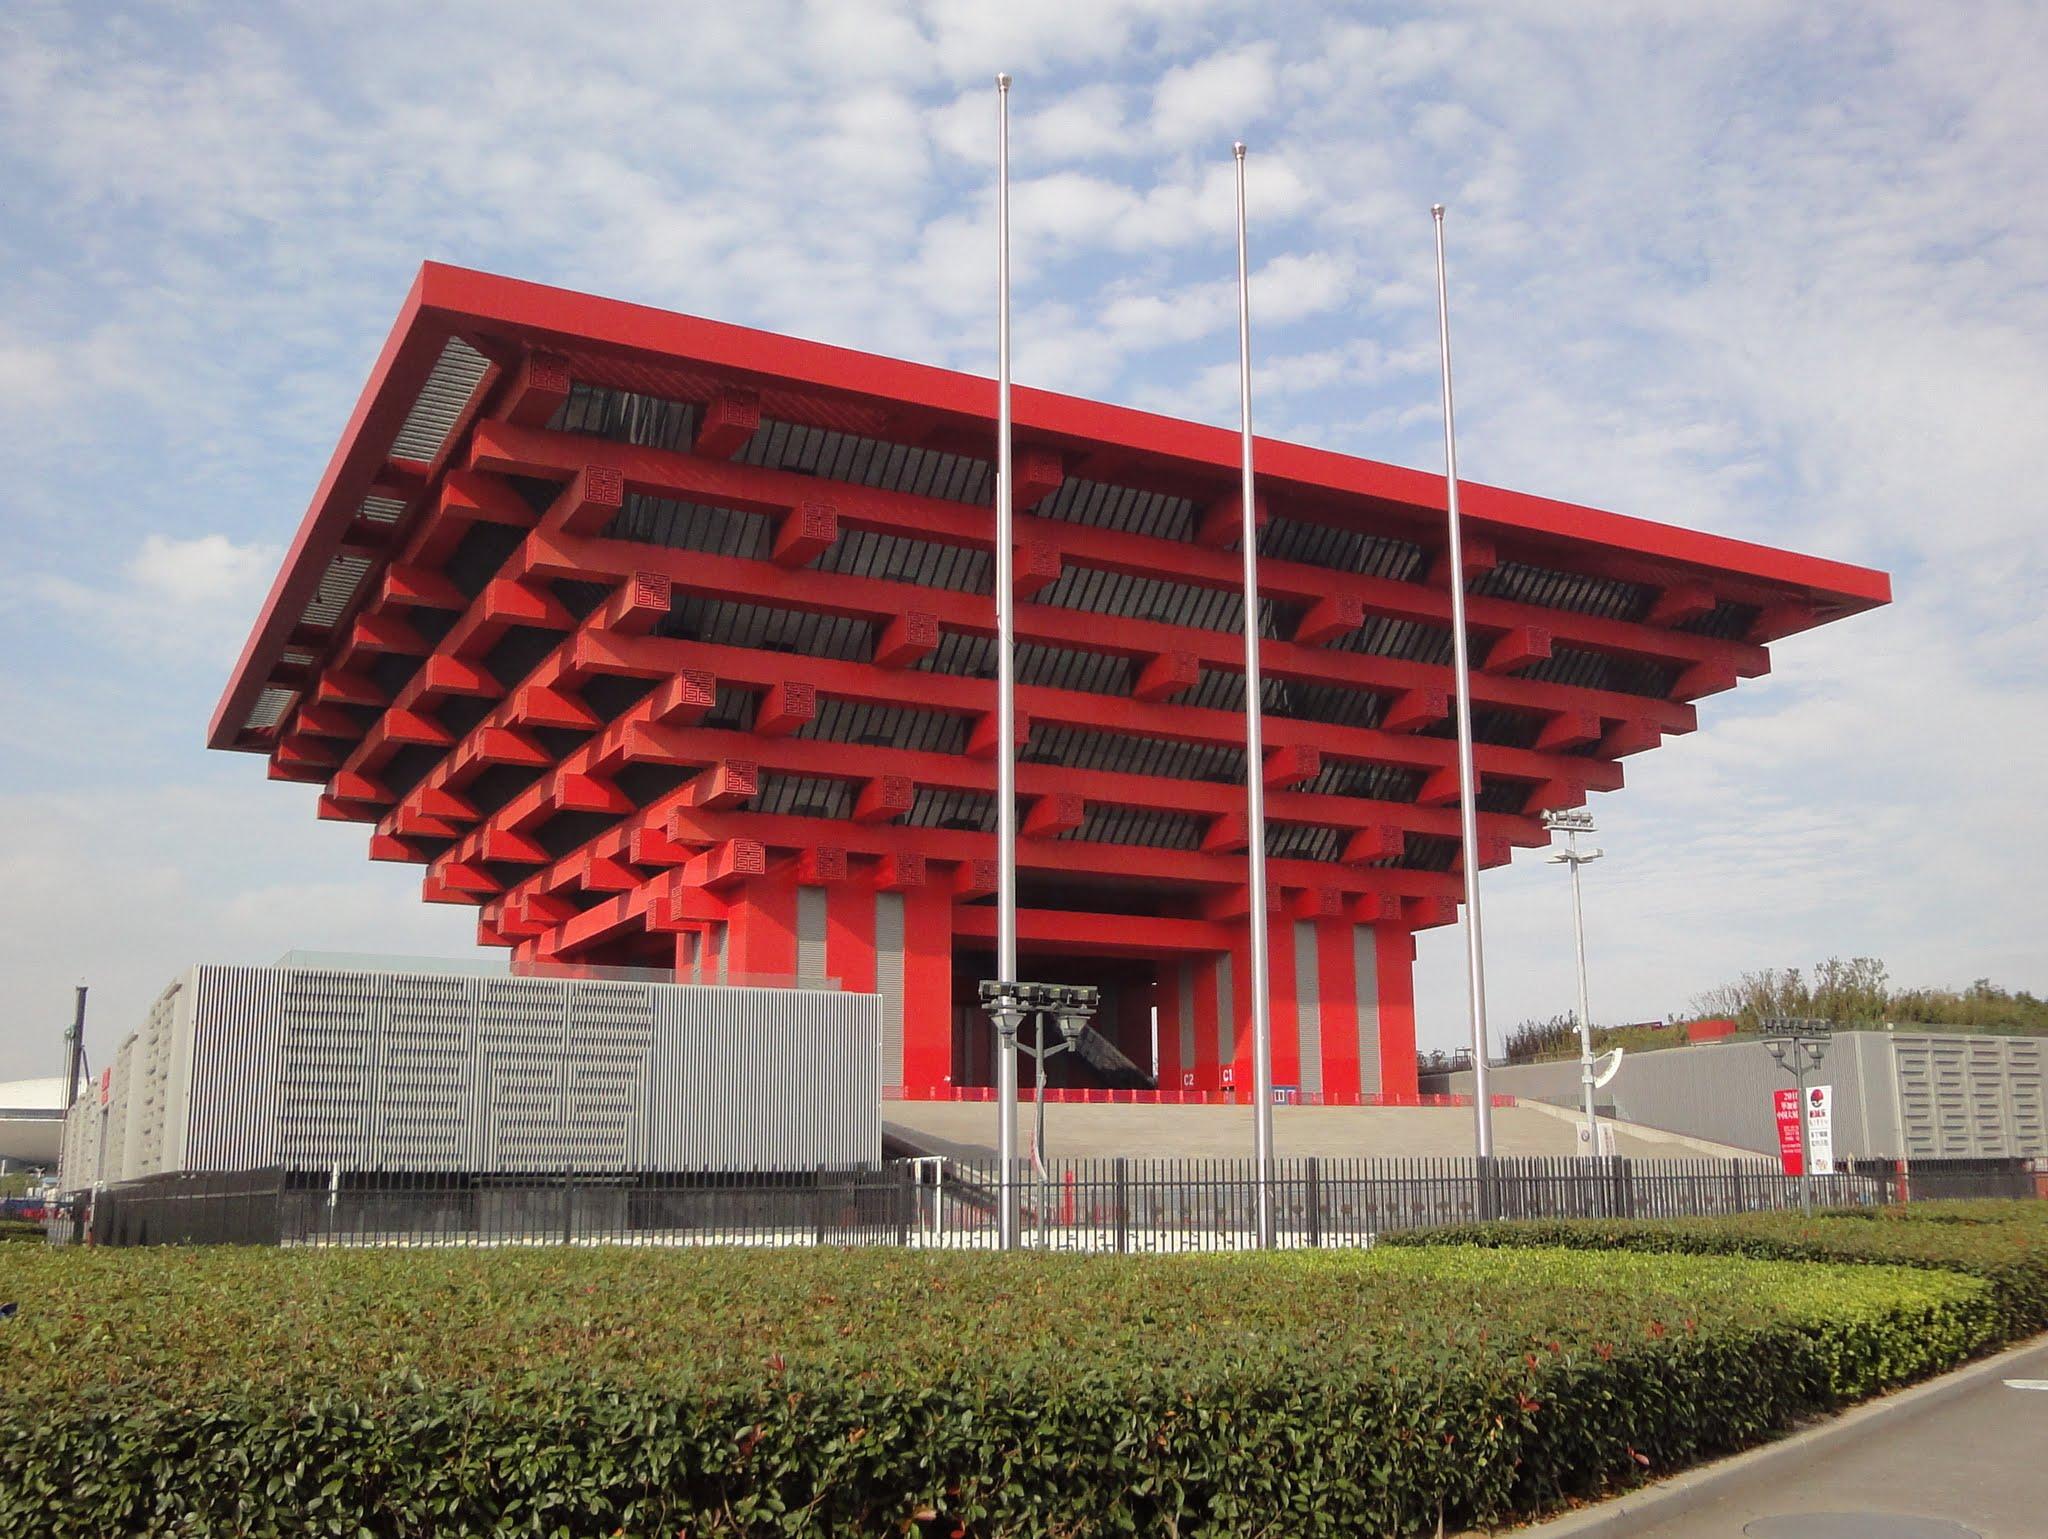 Pavillon chine couronne de l orient chine passion for Architecture chinoise